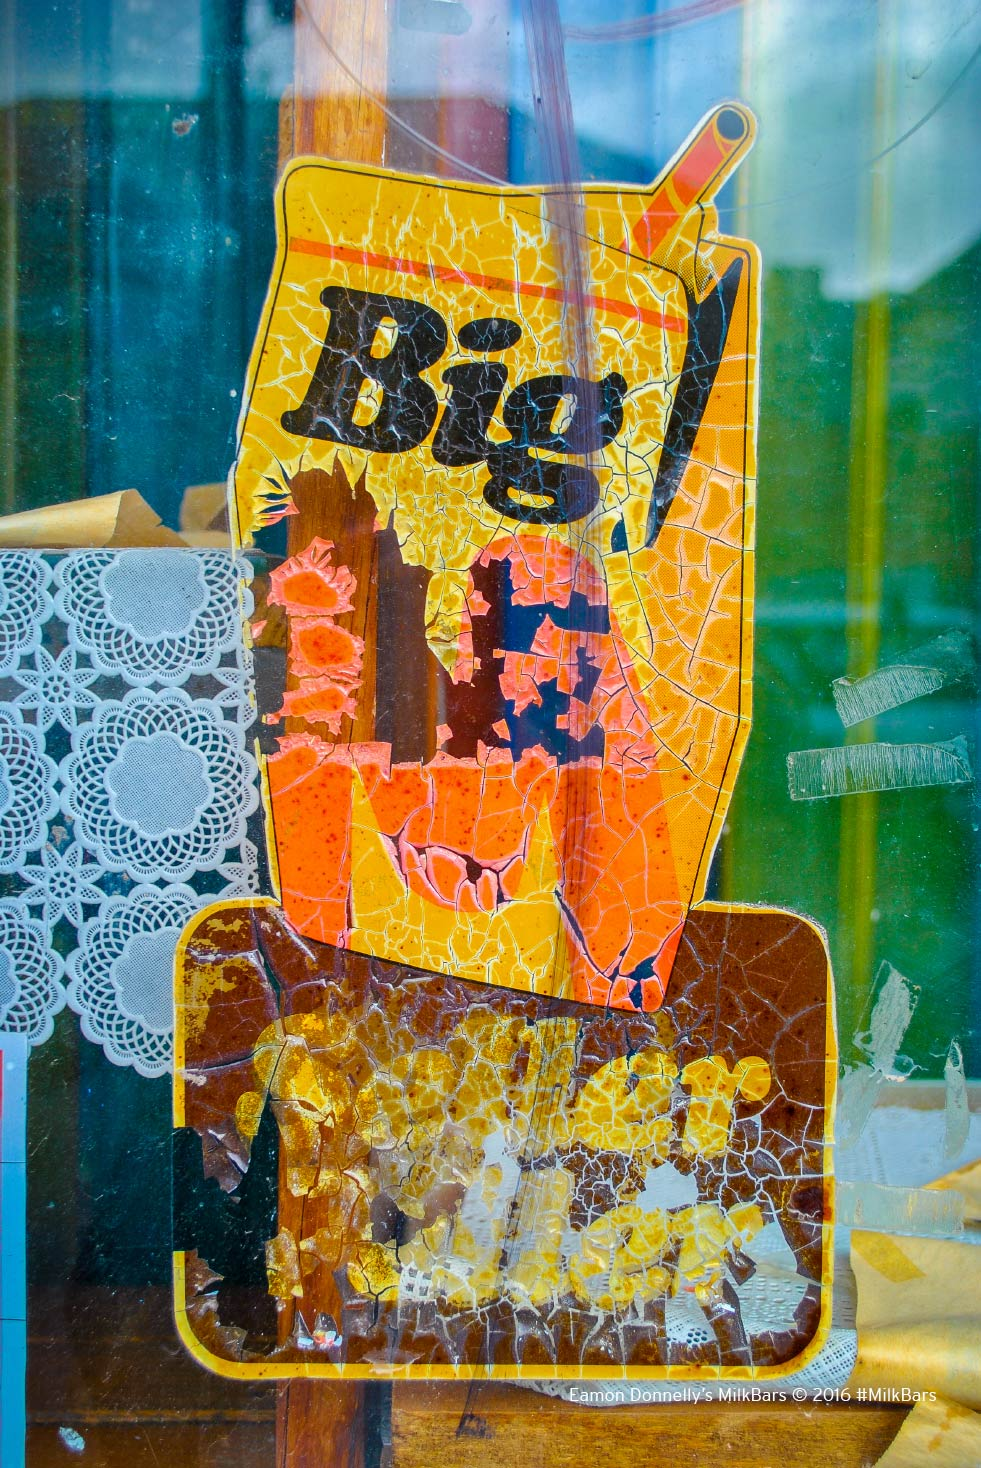 Big-M-Seller-Feller-Milk-Bar-Night-Eamon-Donnelly's-Milk-Bars-Book-Project-(c)-2001-2016.jpg